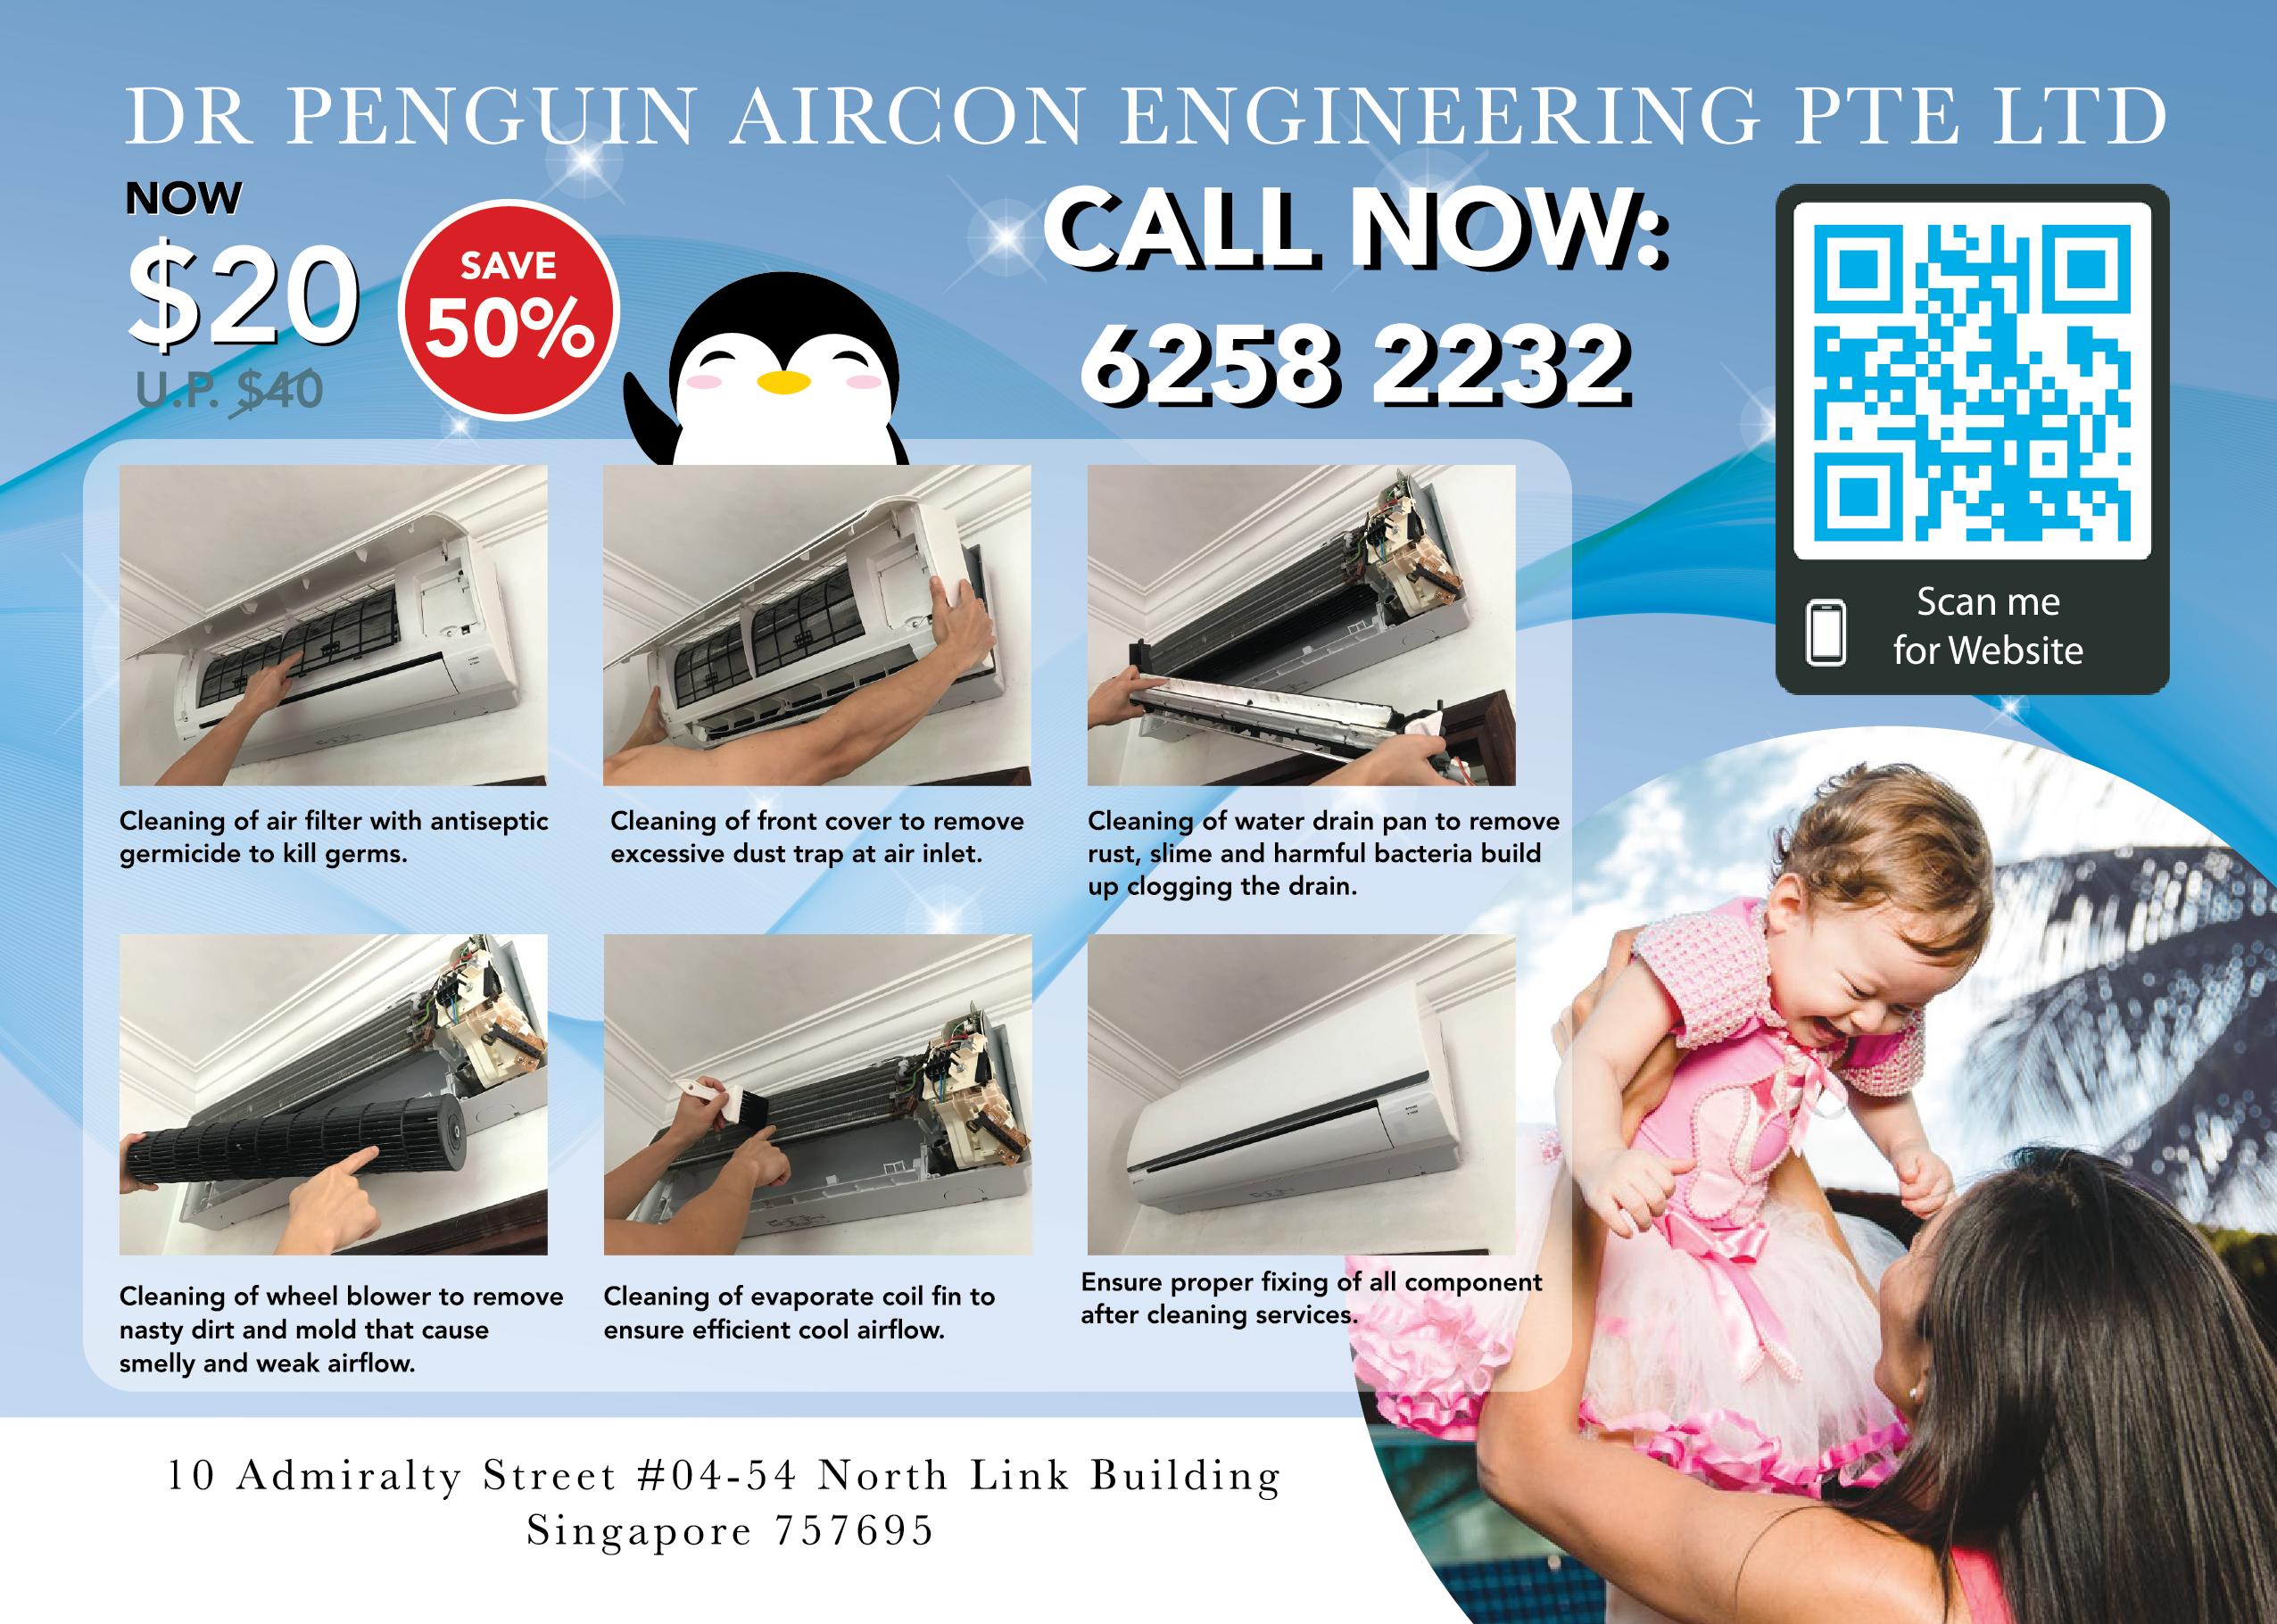 Dr Penguin Aircon Services